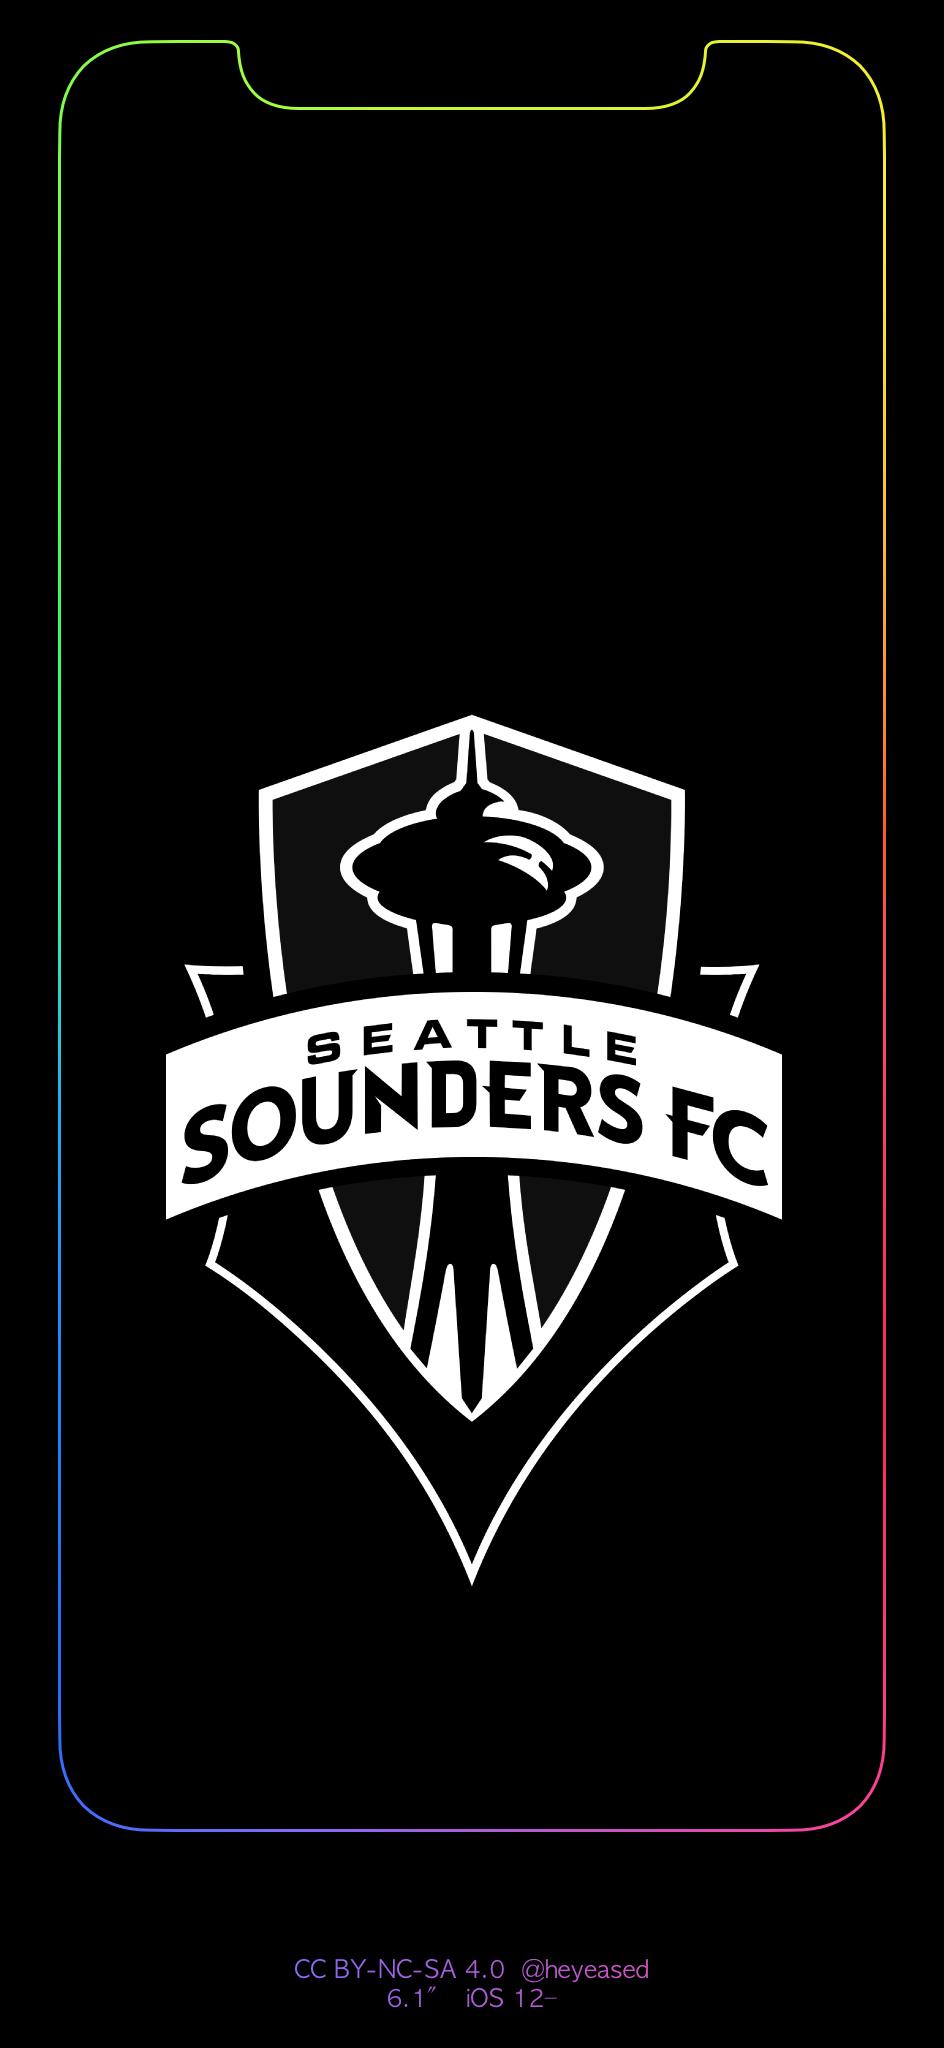 Seattle Sounders Wallpaper Iphone   944x2048 Wallpaper   Ecopetitcat 944x2048